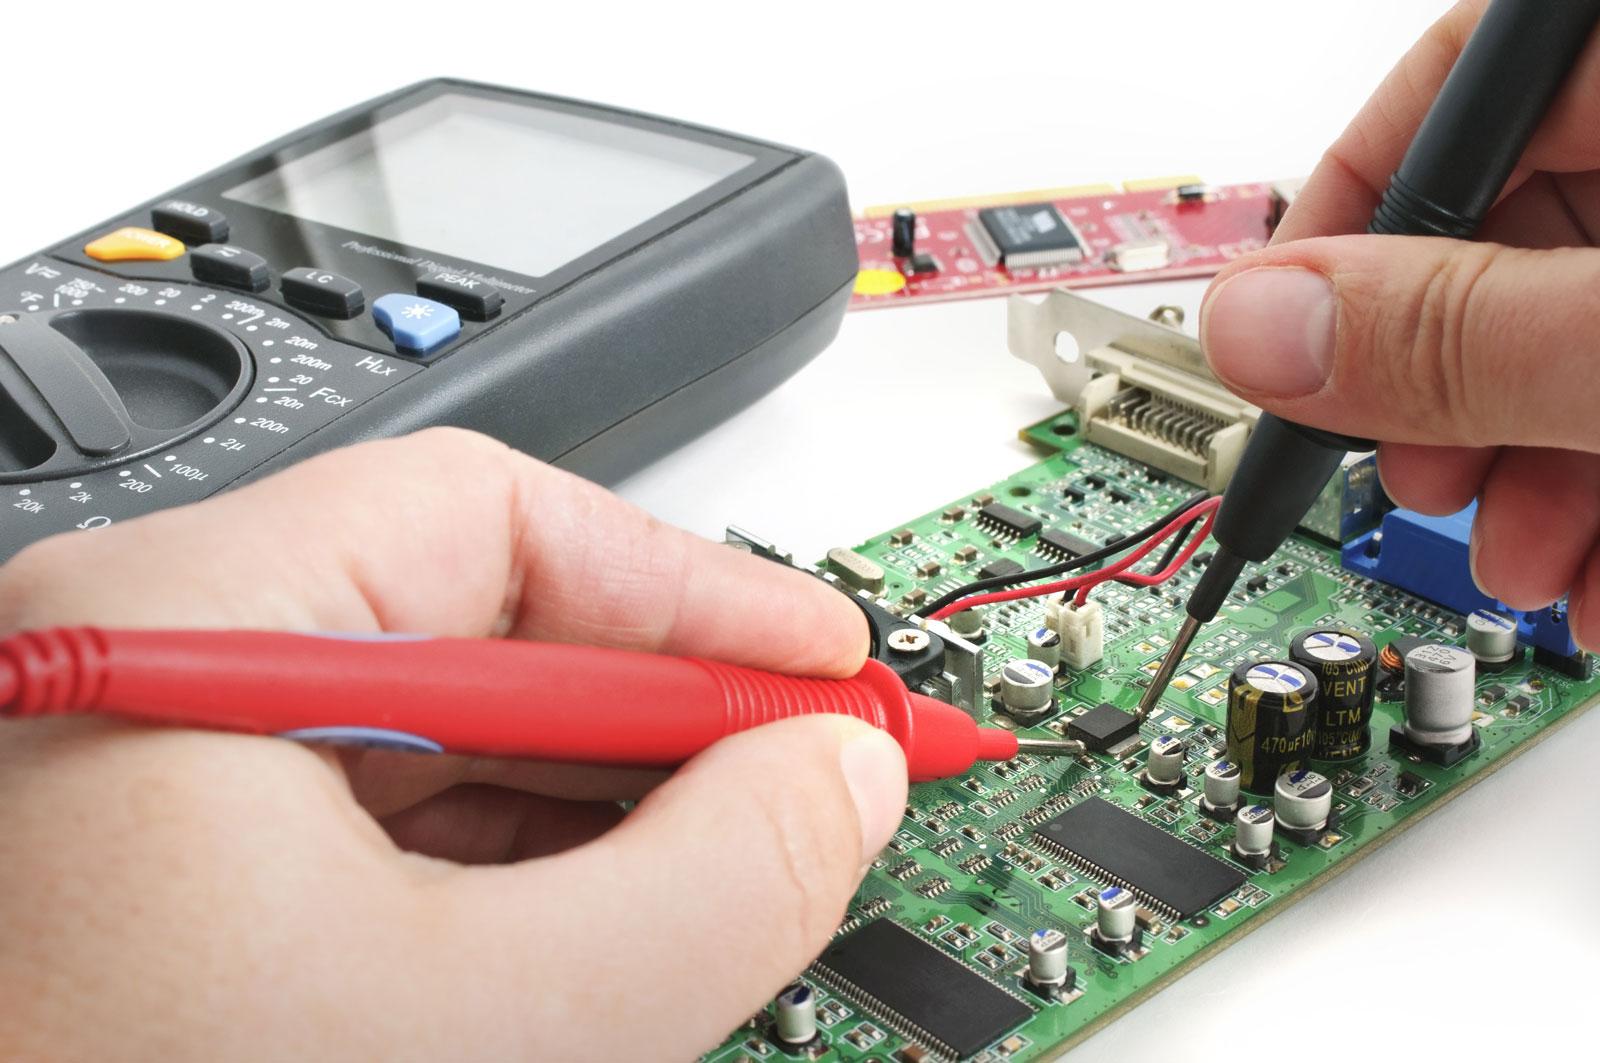 British Marine and NMEA to Offer Marine Electronics